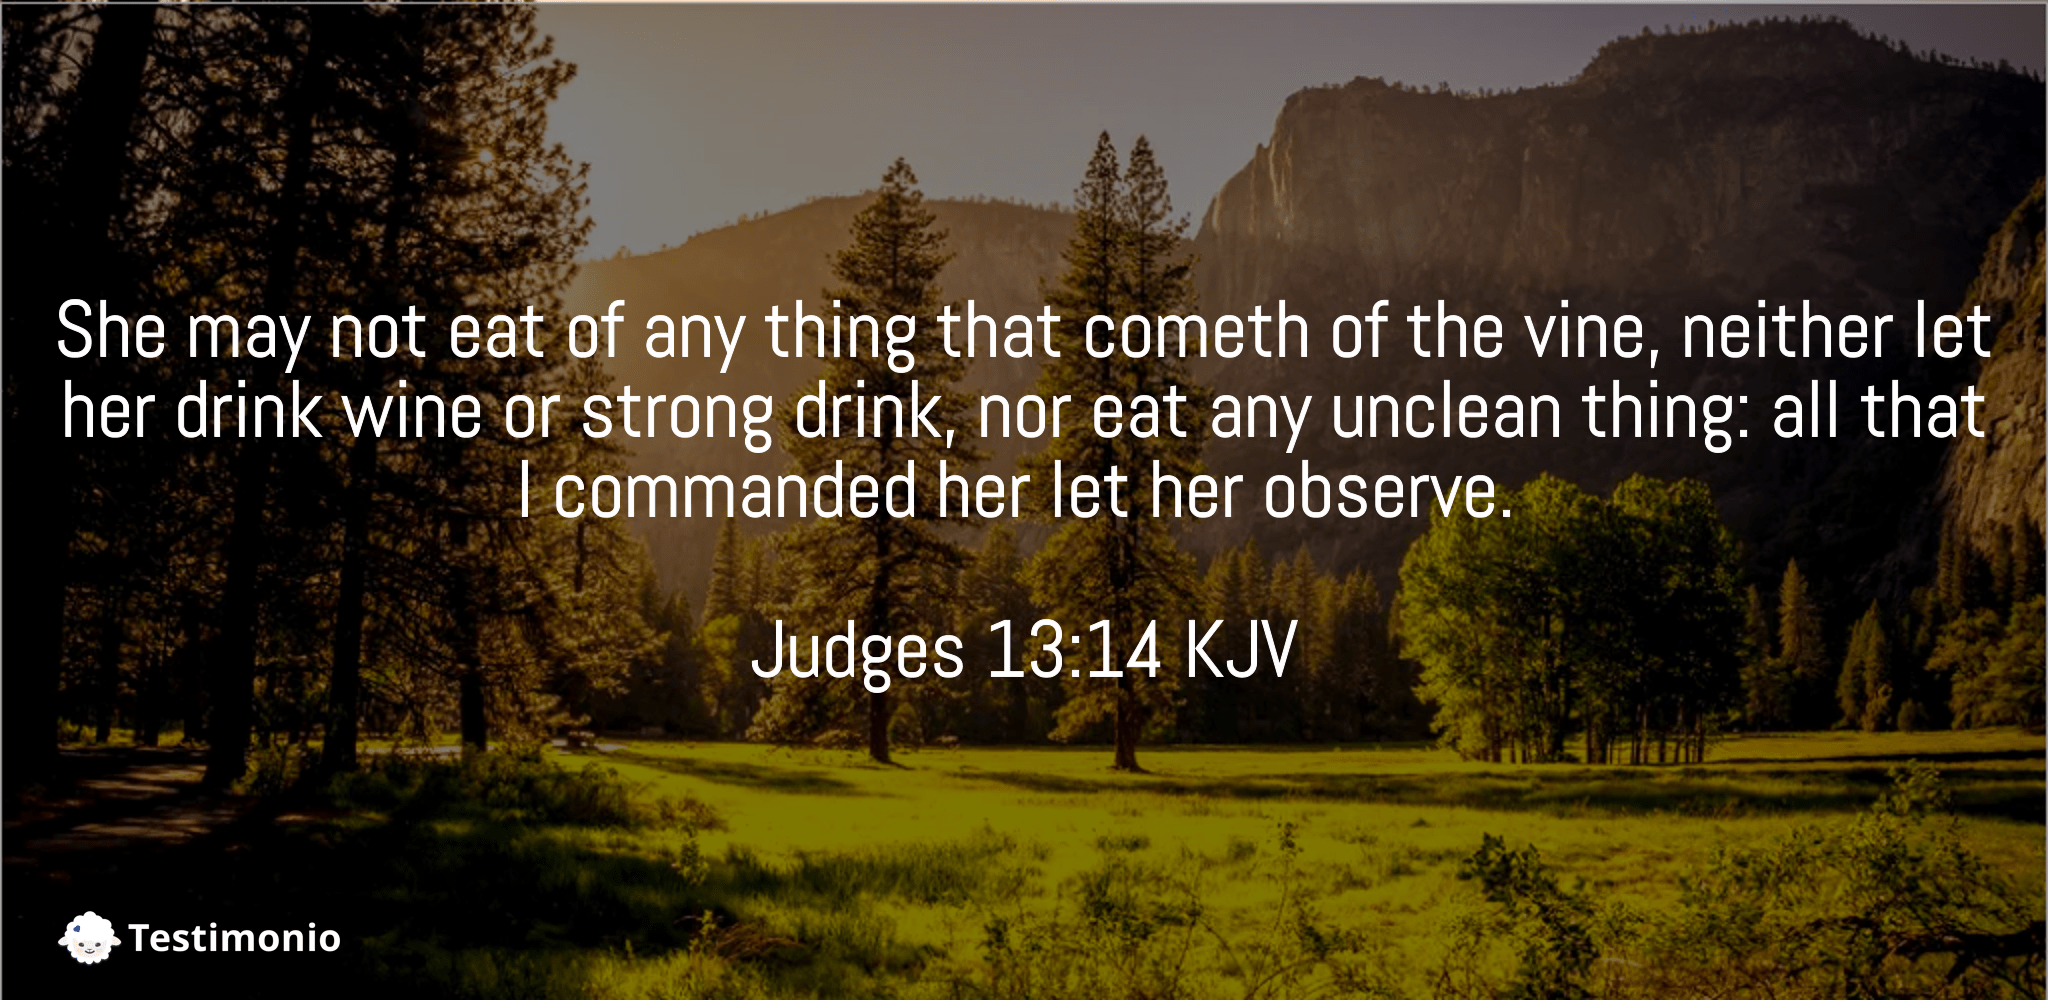 Judges 13:14